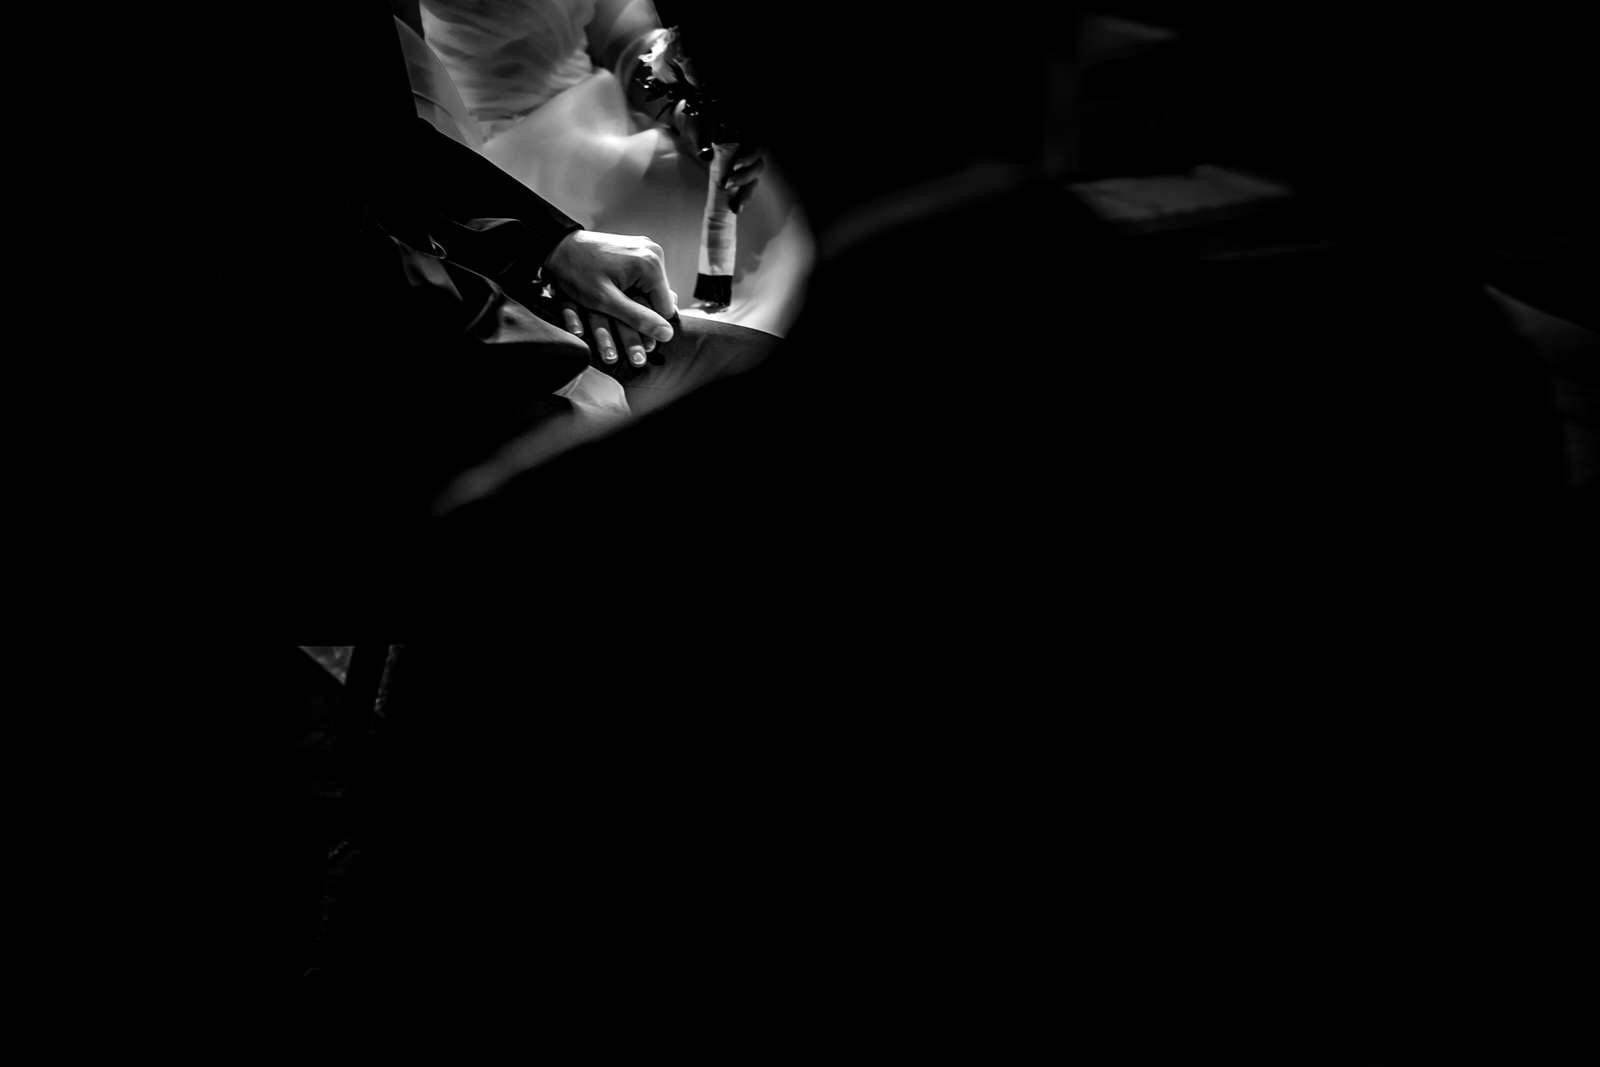 Mariage Chapelle Abondance Photographe Gerald Mattel (1).jpg